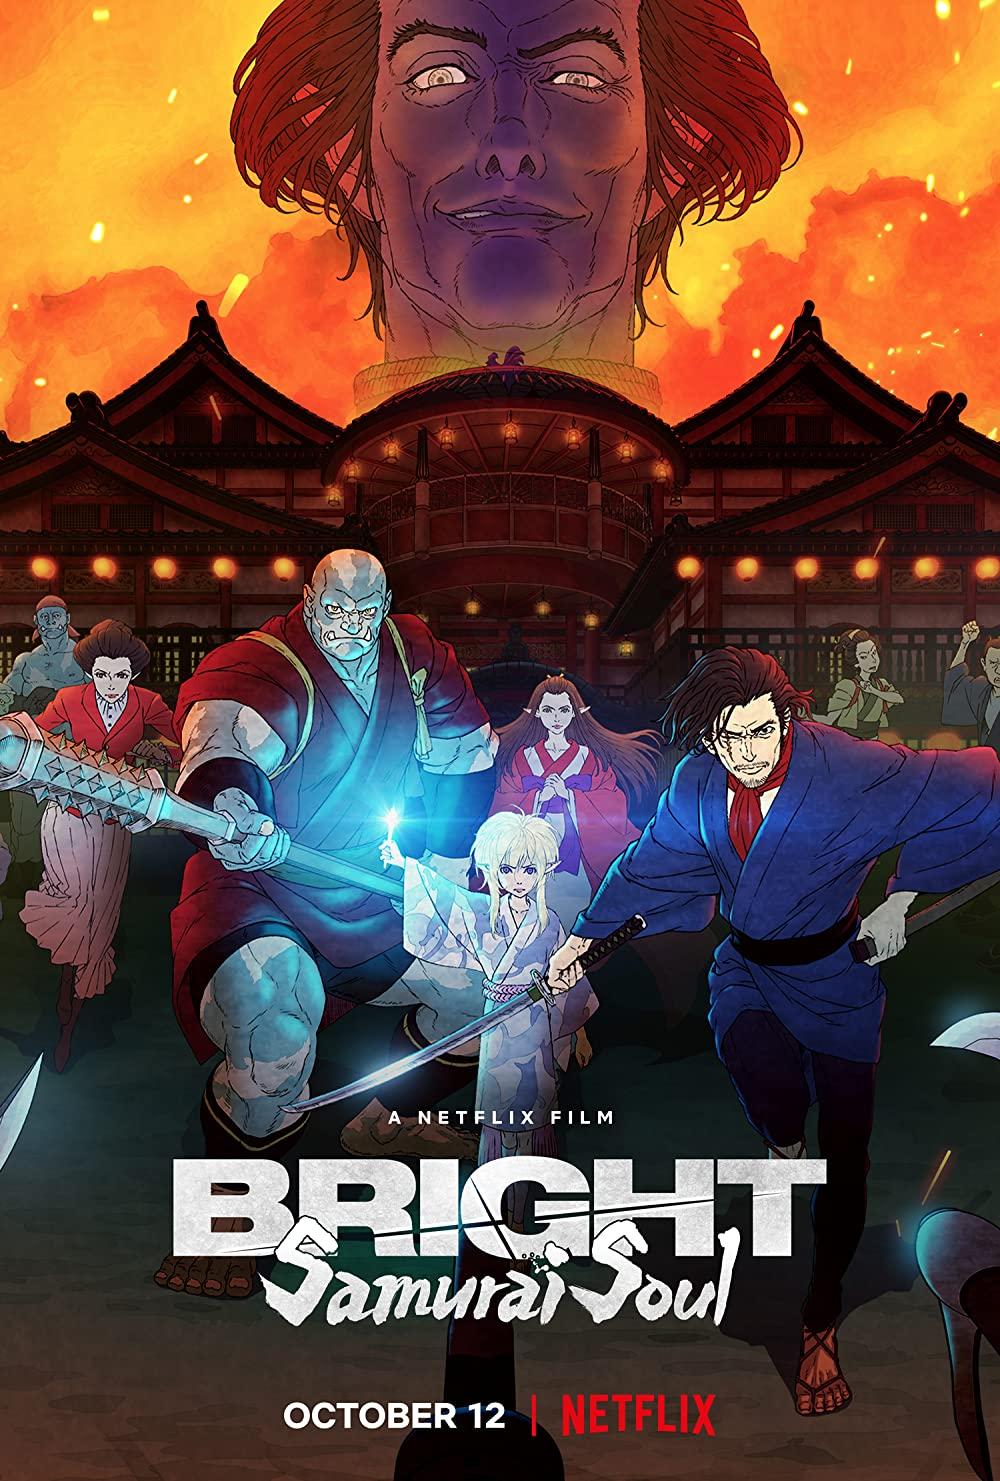 Chiếc Đũa Quyền Năng: Linh Hồn Samurai – Bright: Samurai Soul